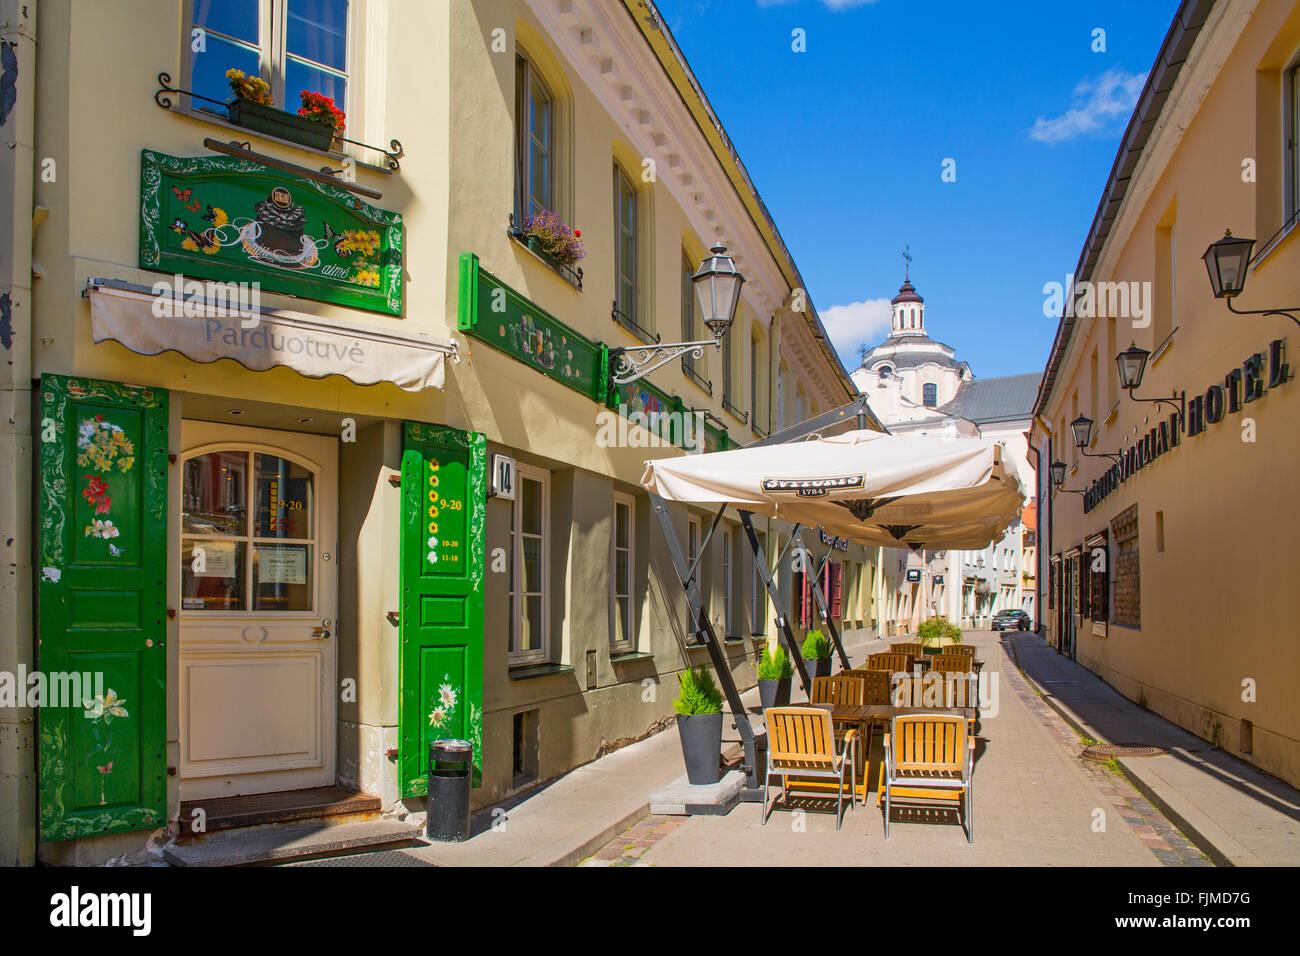 Geographie/Reisen, Litauen, Vilnius, Gasse in der Altstadt, Additional-Rights - Clearance-Info - Not-Available Stockbild